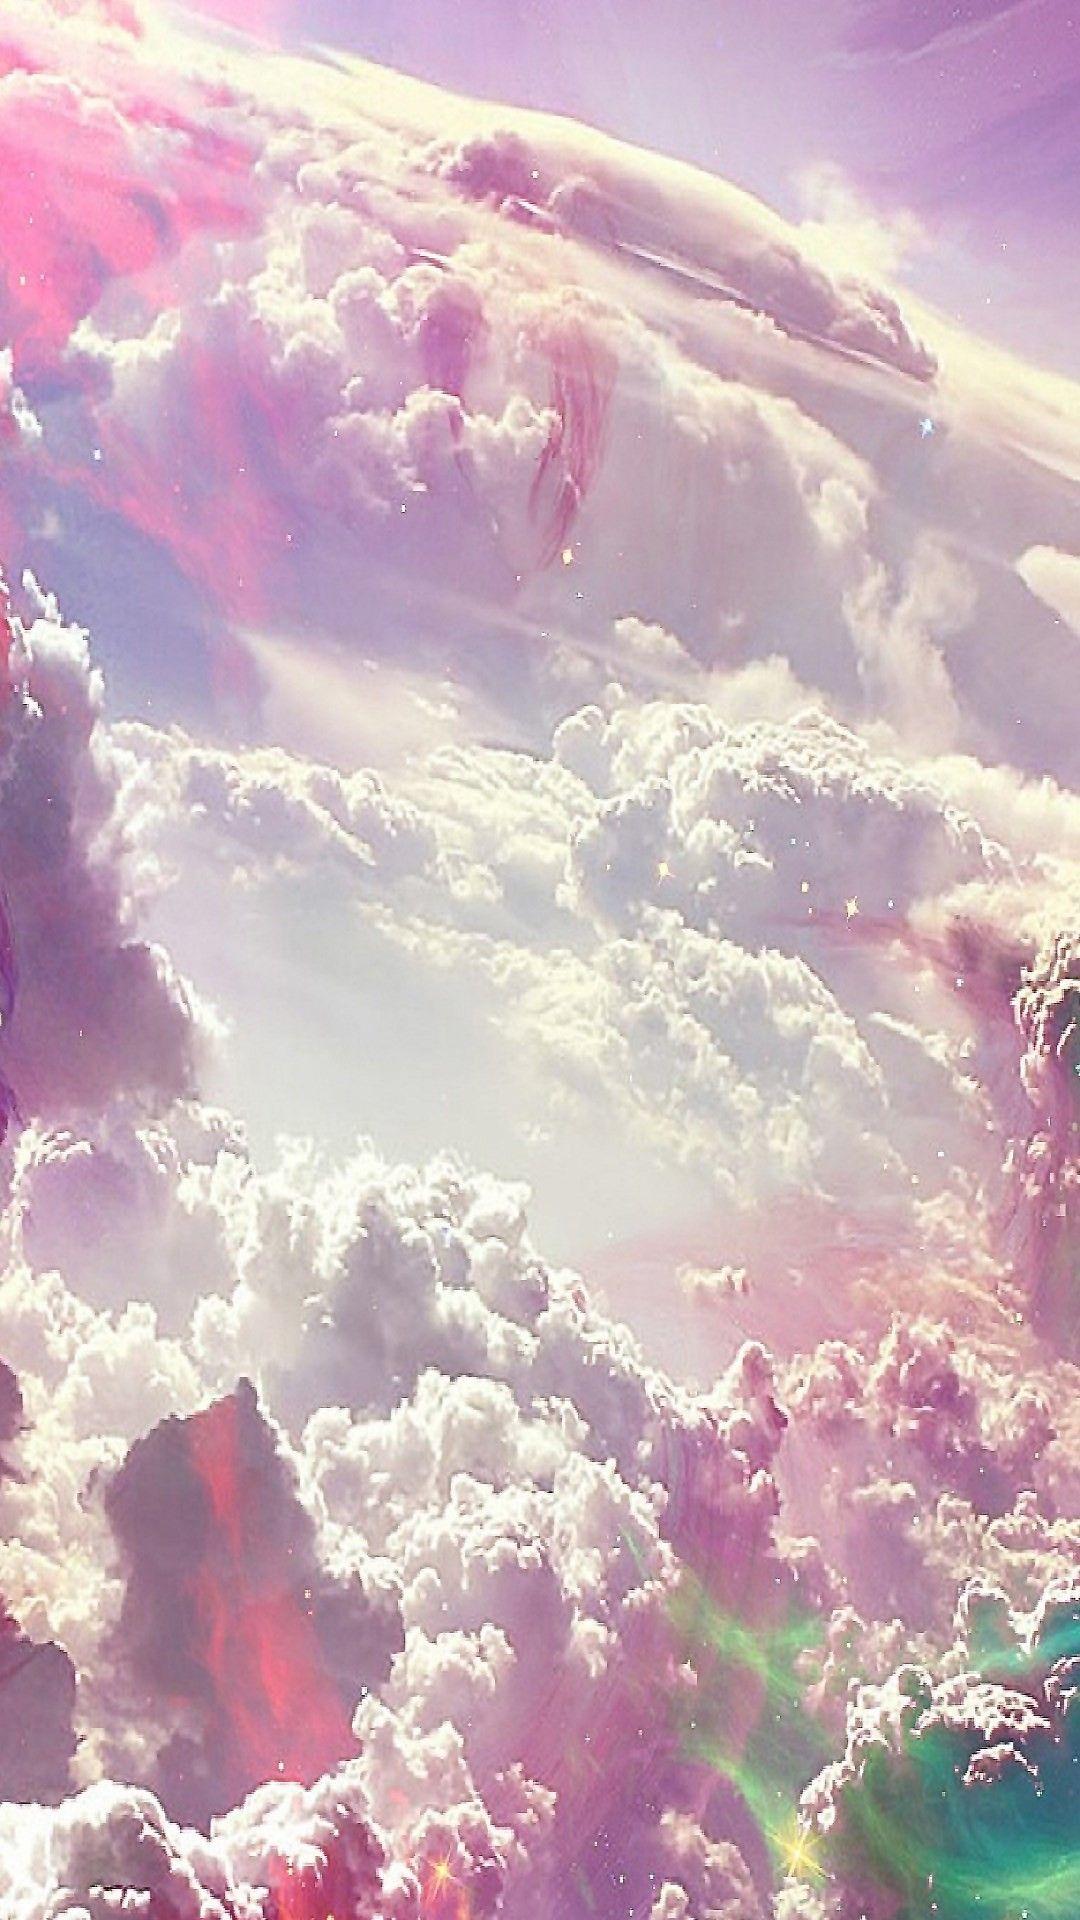 Wallpapers Cloud artwork, Colorful clouds, Iphone wallpaper